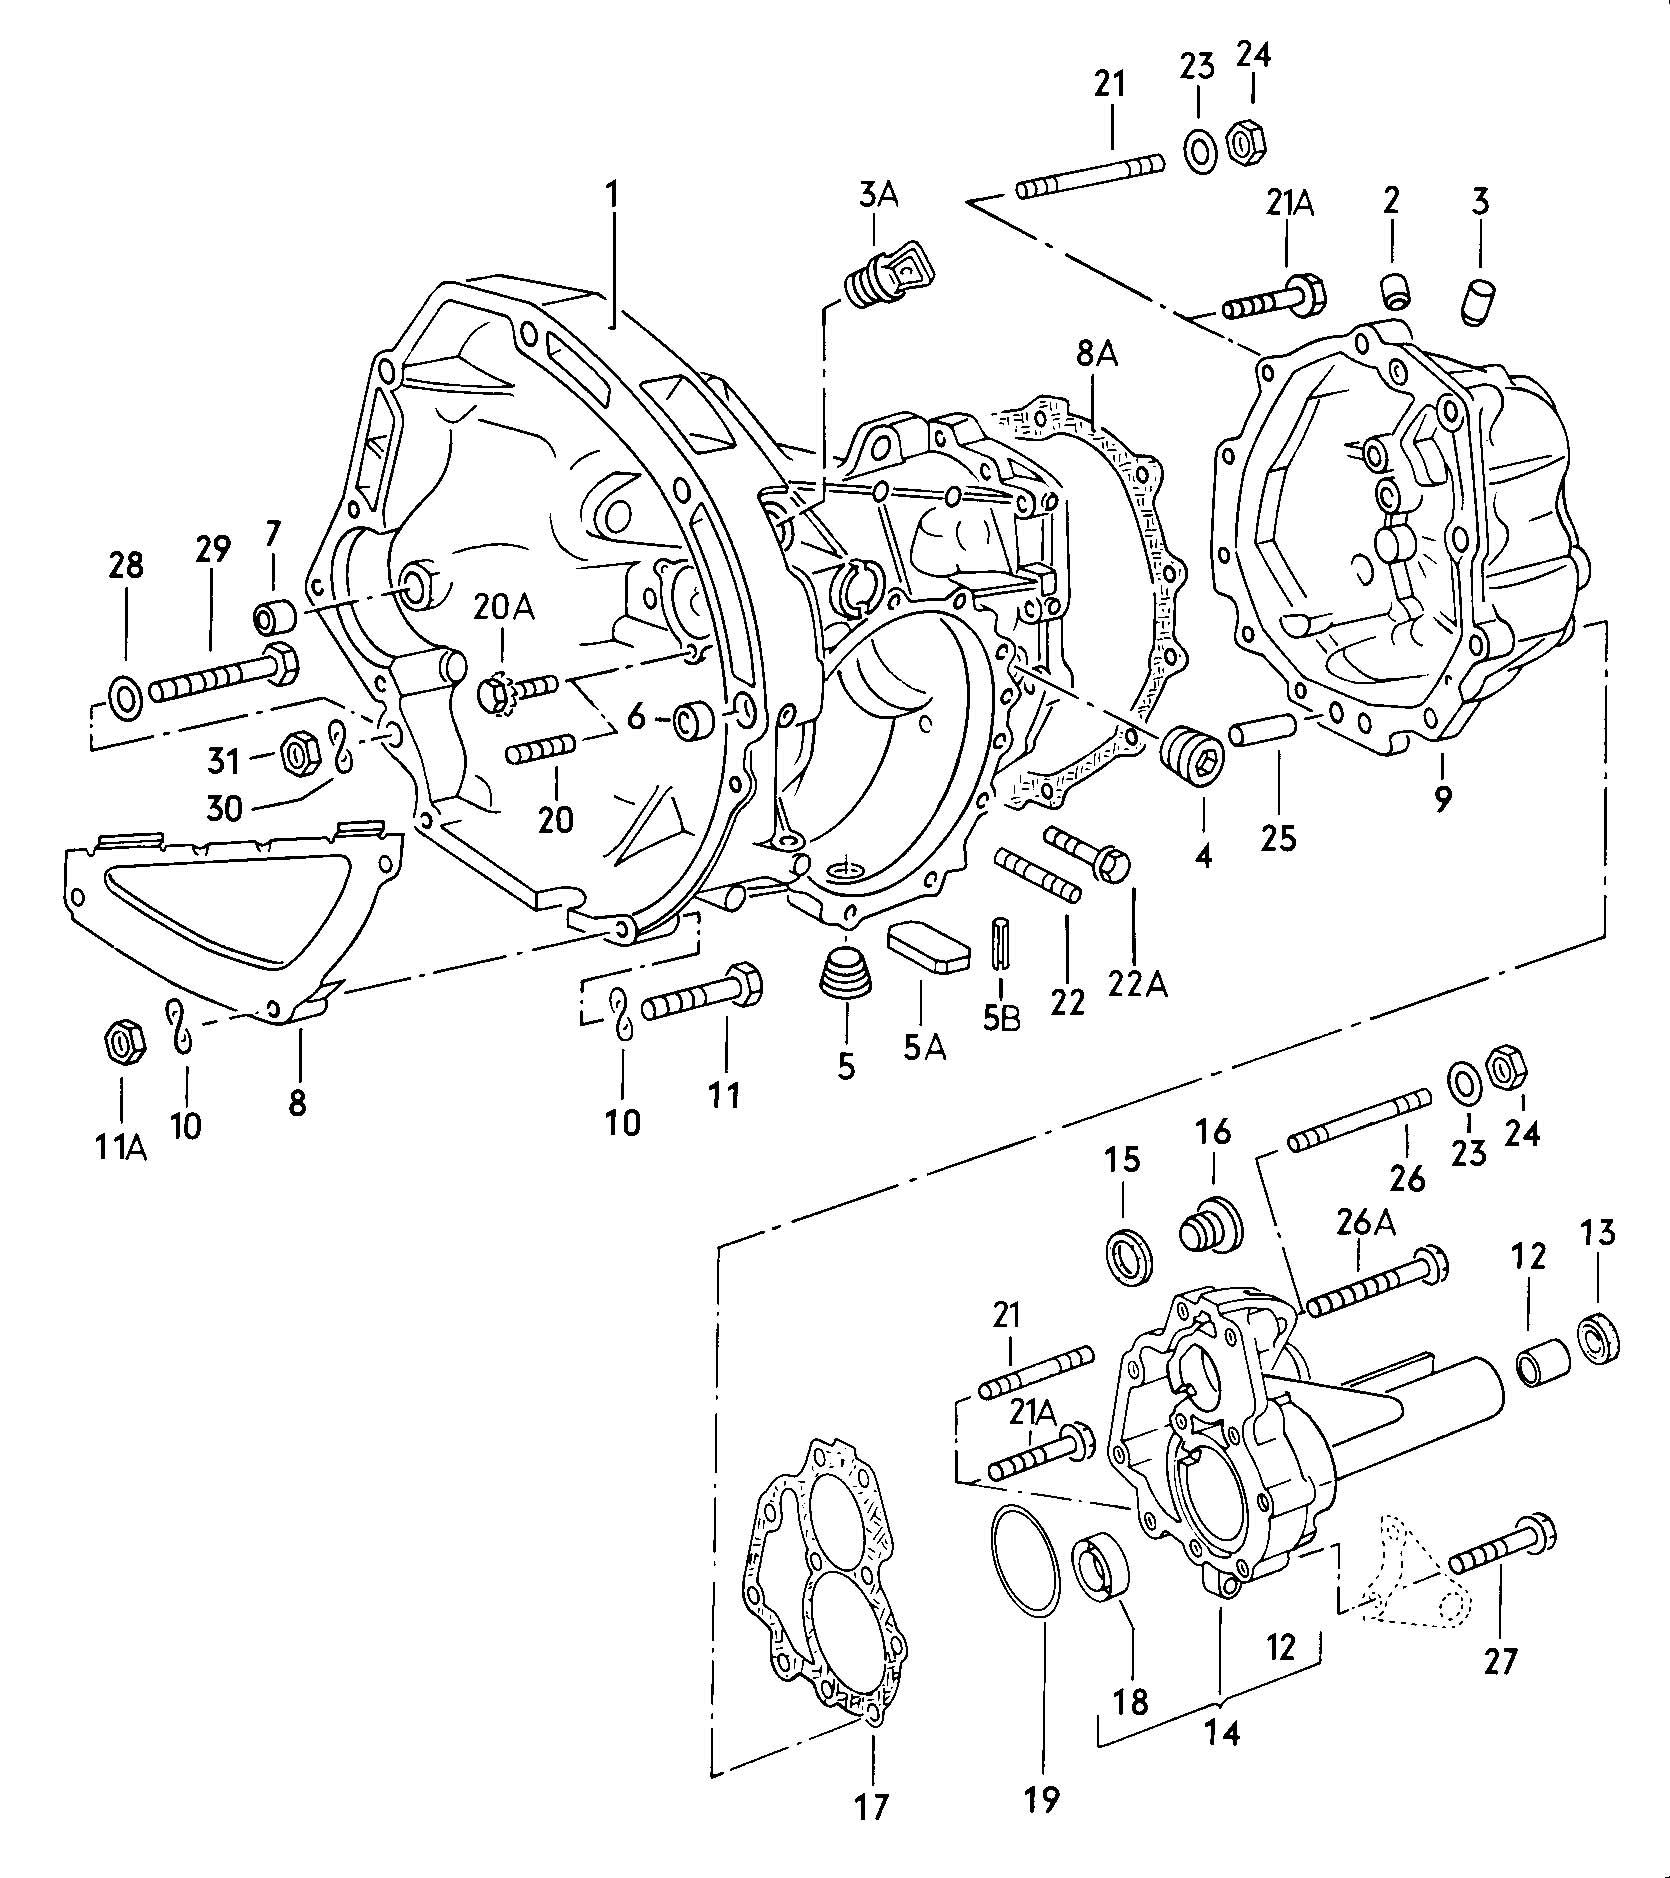 Diagram Vw Jetta Manual Transmission Diagram Full